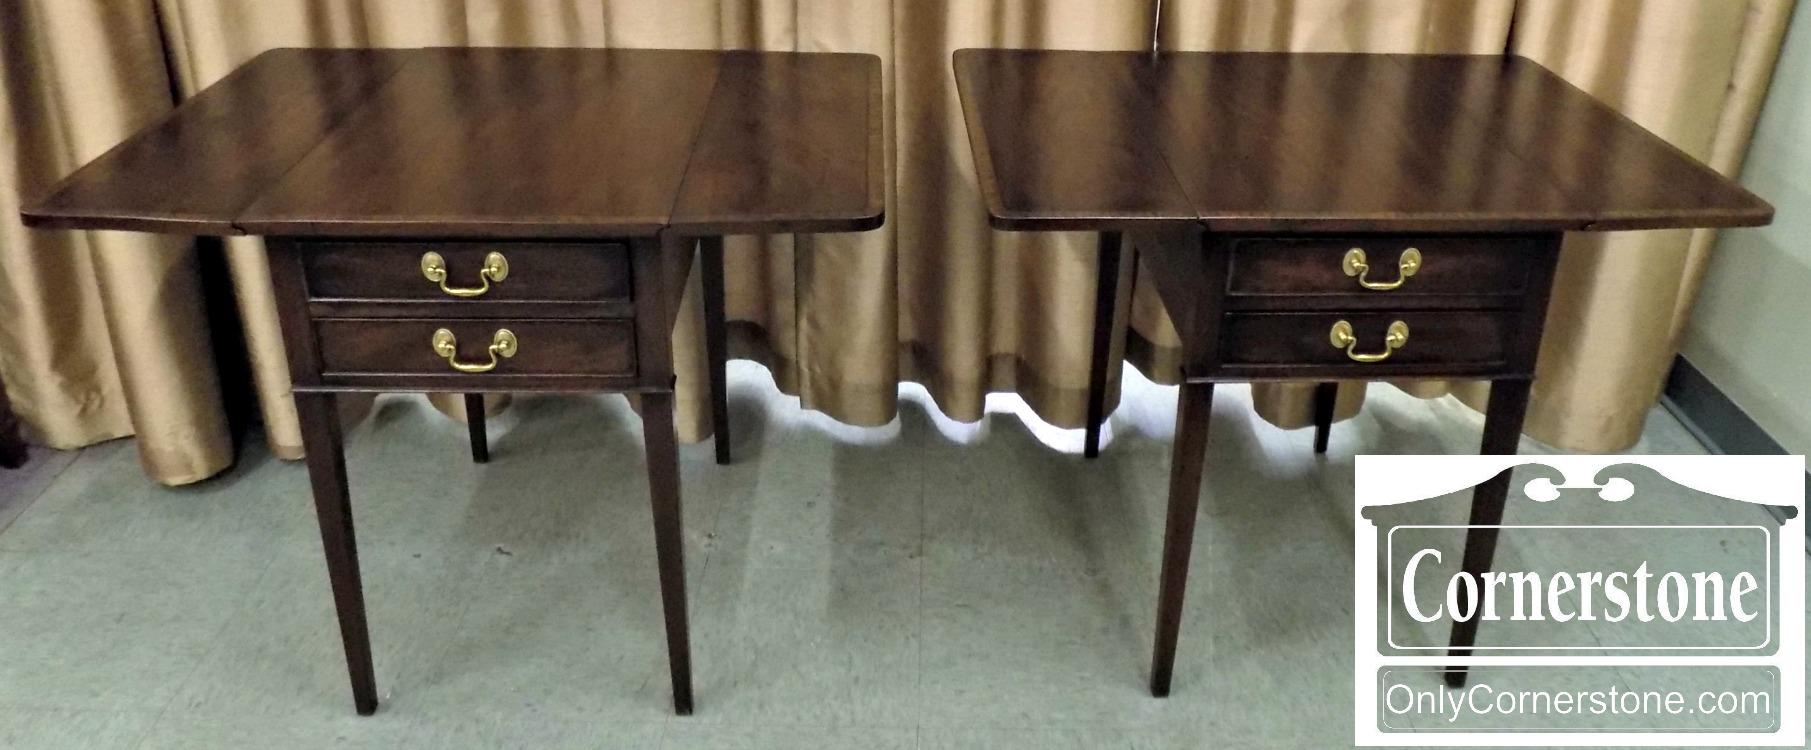 100+ [ Henkel Harris Dining Room Table ] | Interesting Henkel ...